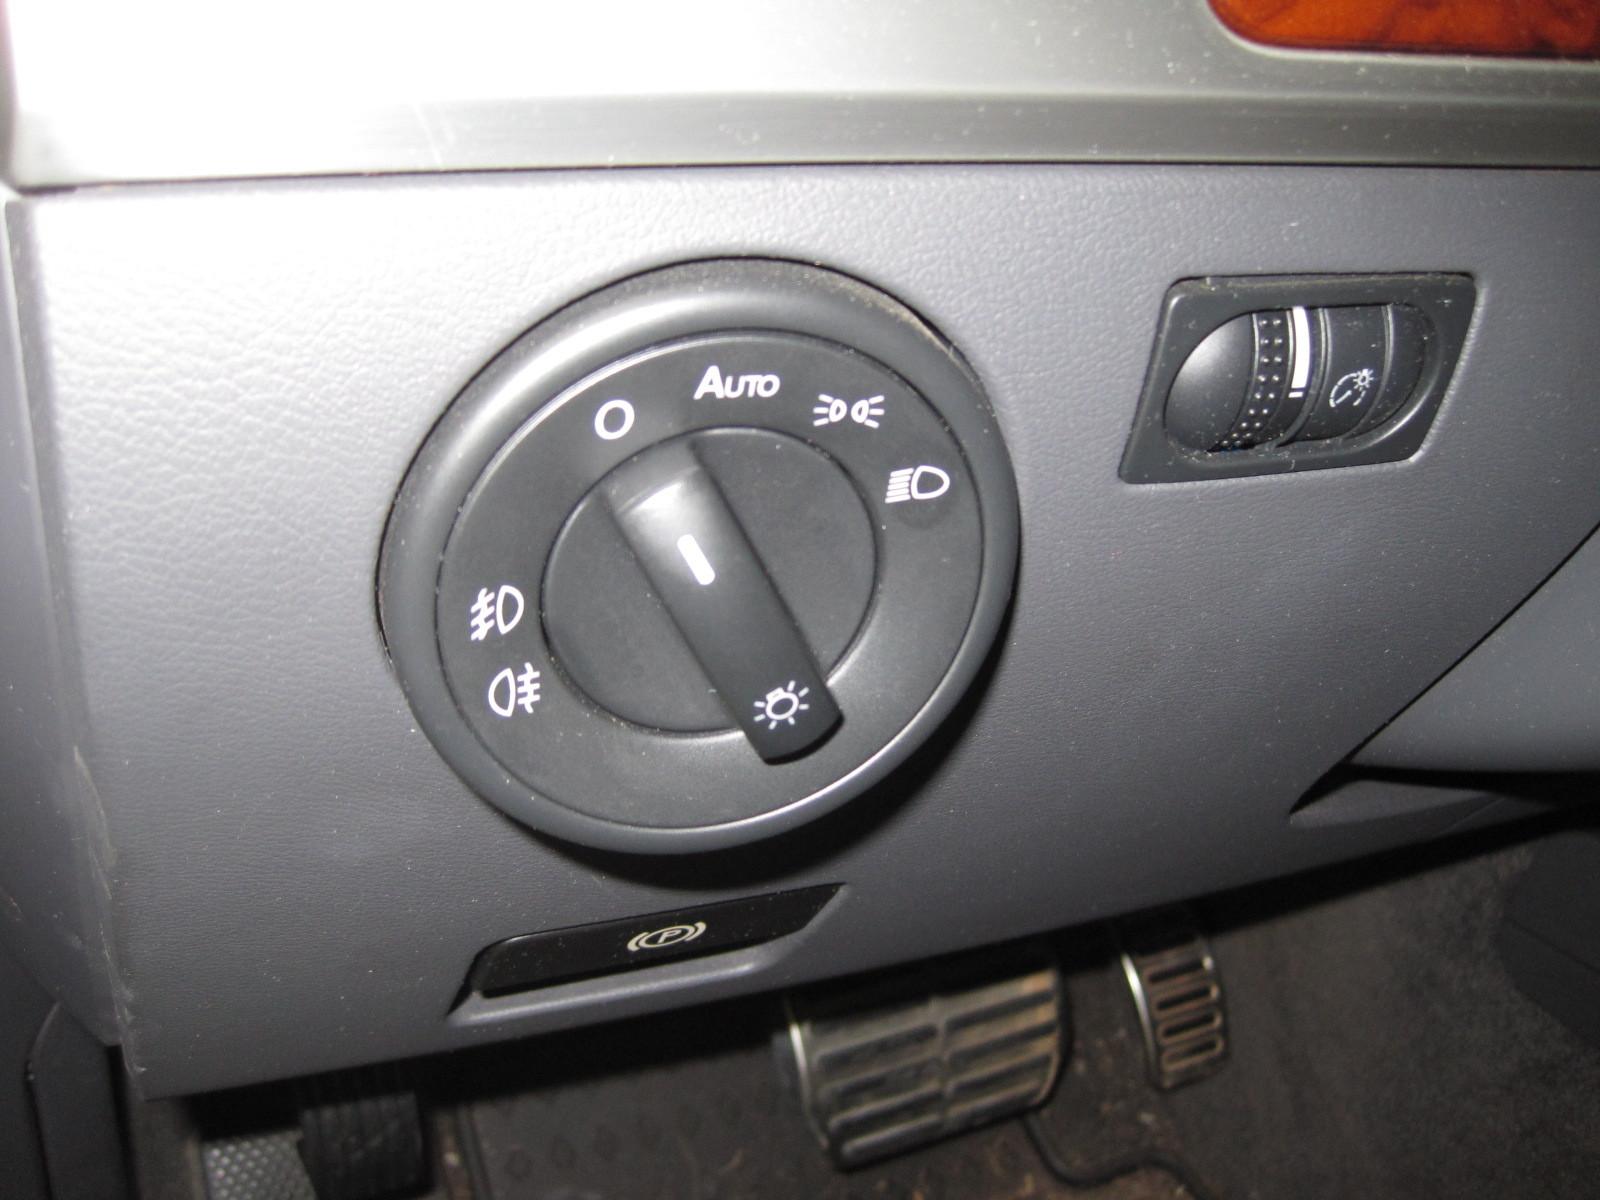 vw touareg 2005 wiring diagram kitchenaid professional 600 parts 2004 2010 volkswagen european headlight switch